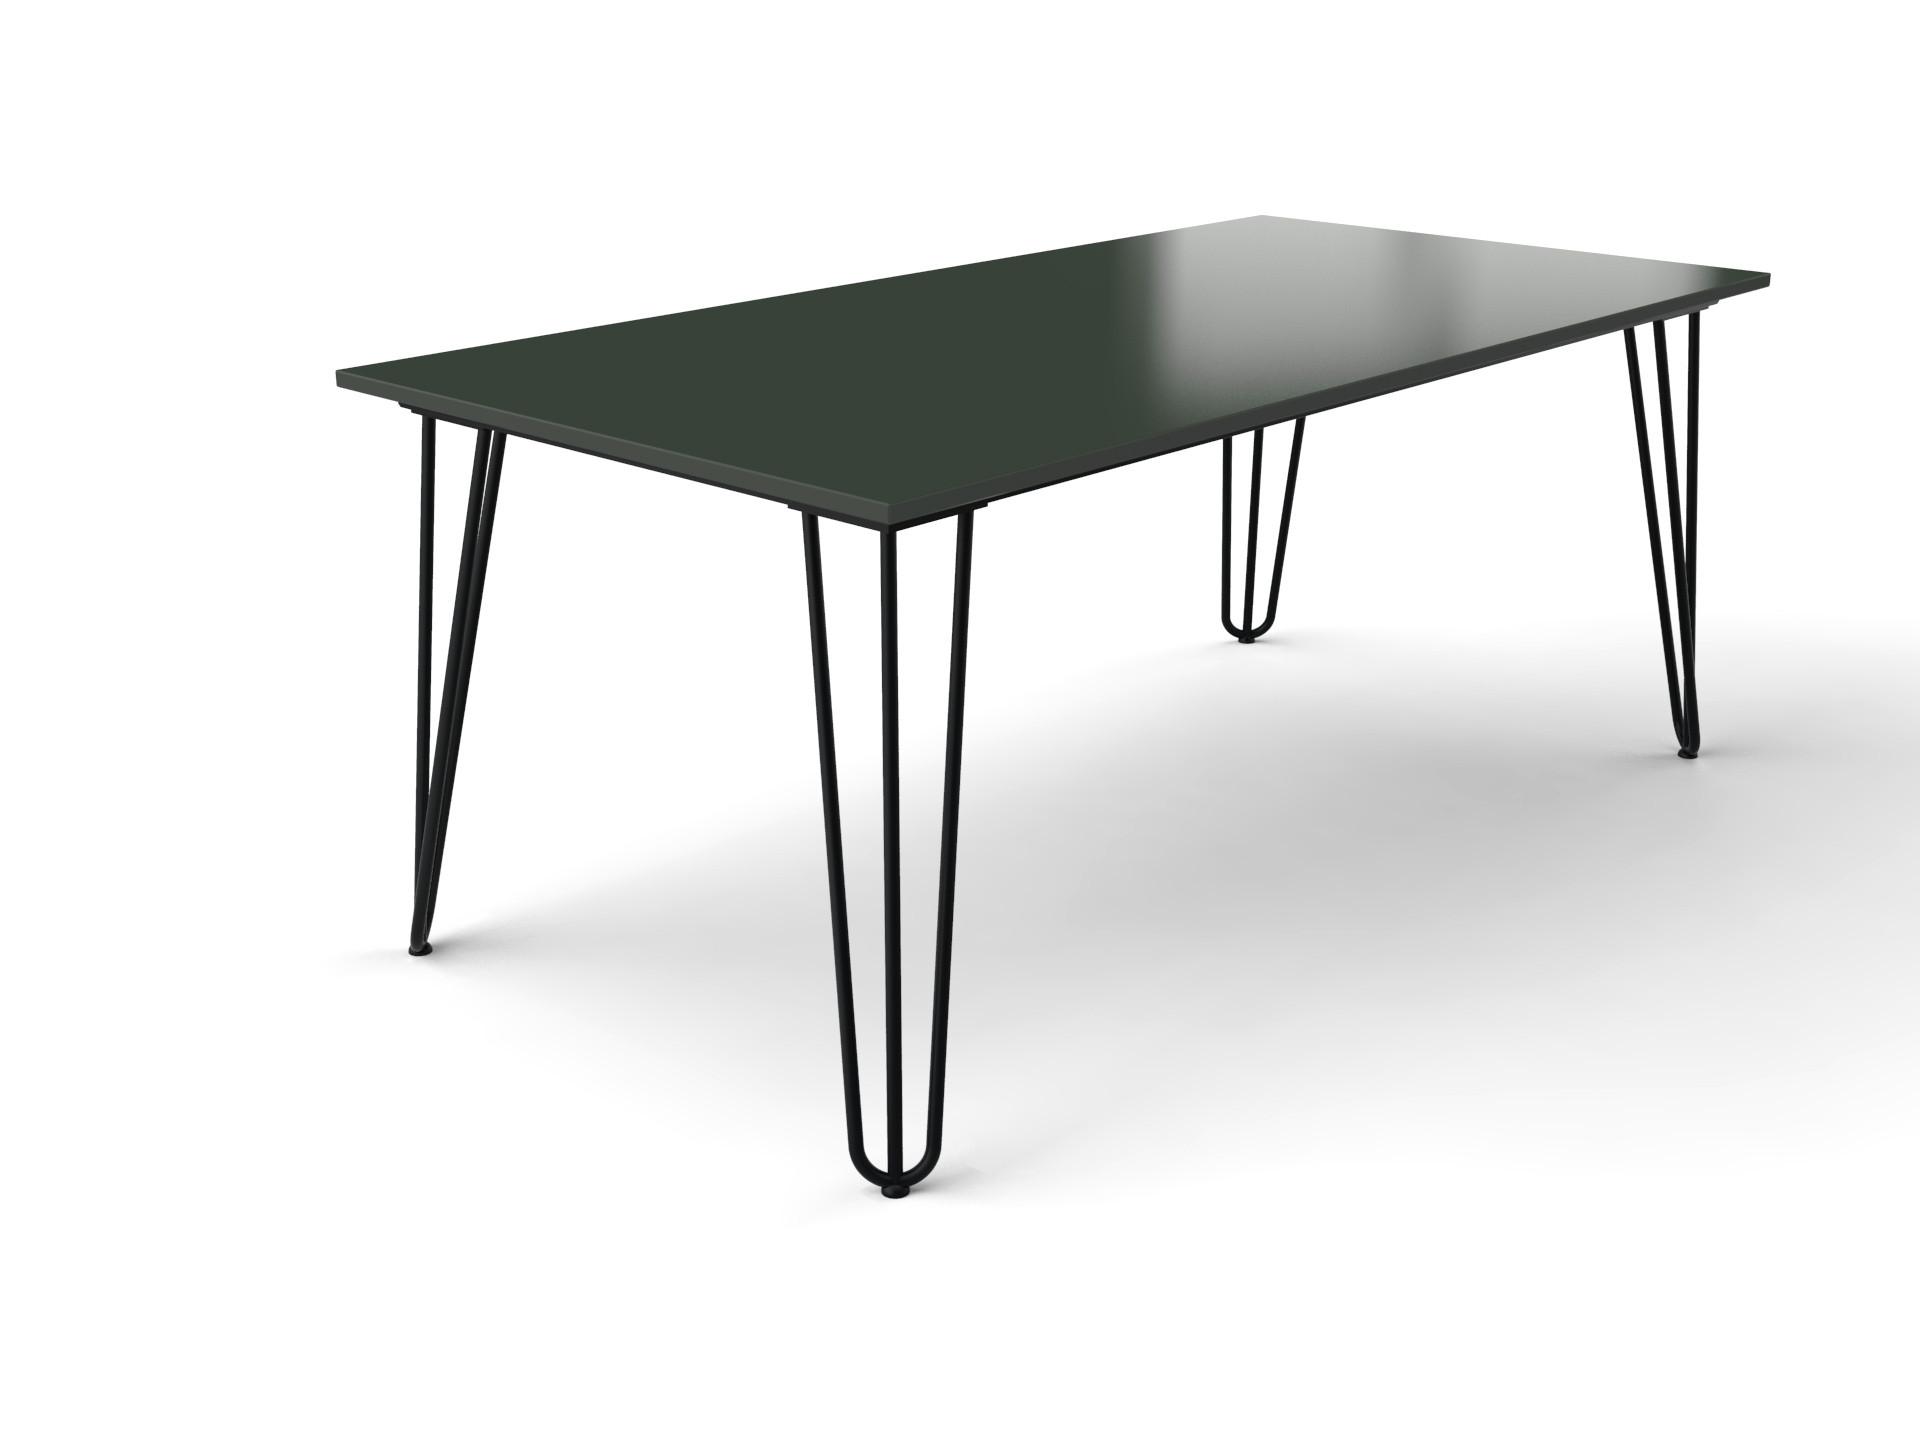 Stockholm hairpin tafel met groen Dekton Feroe tafelblad